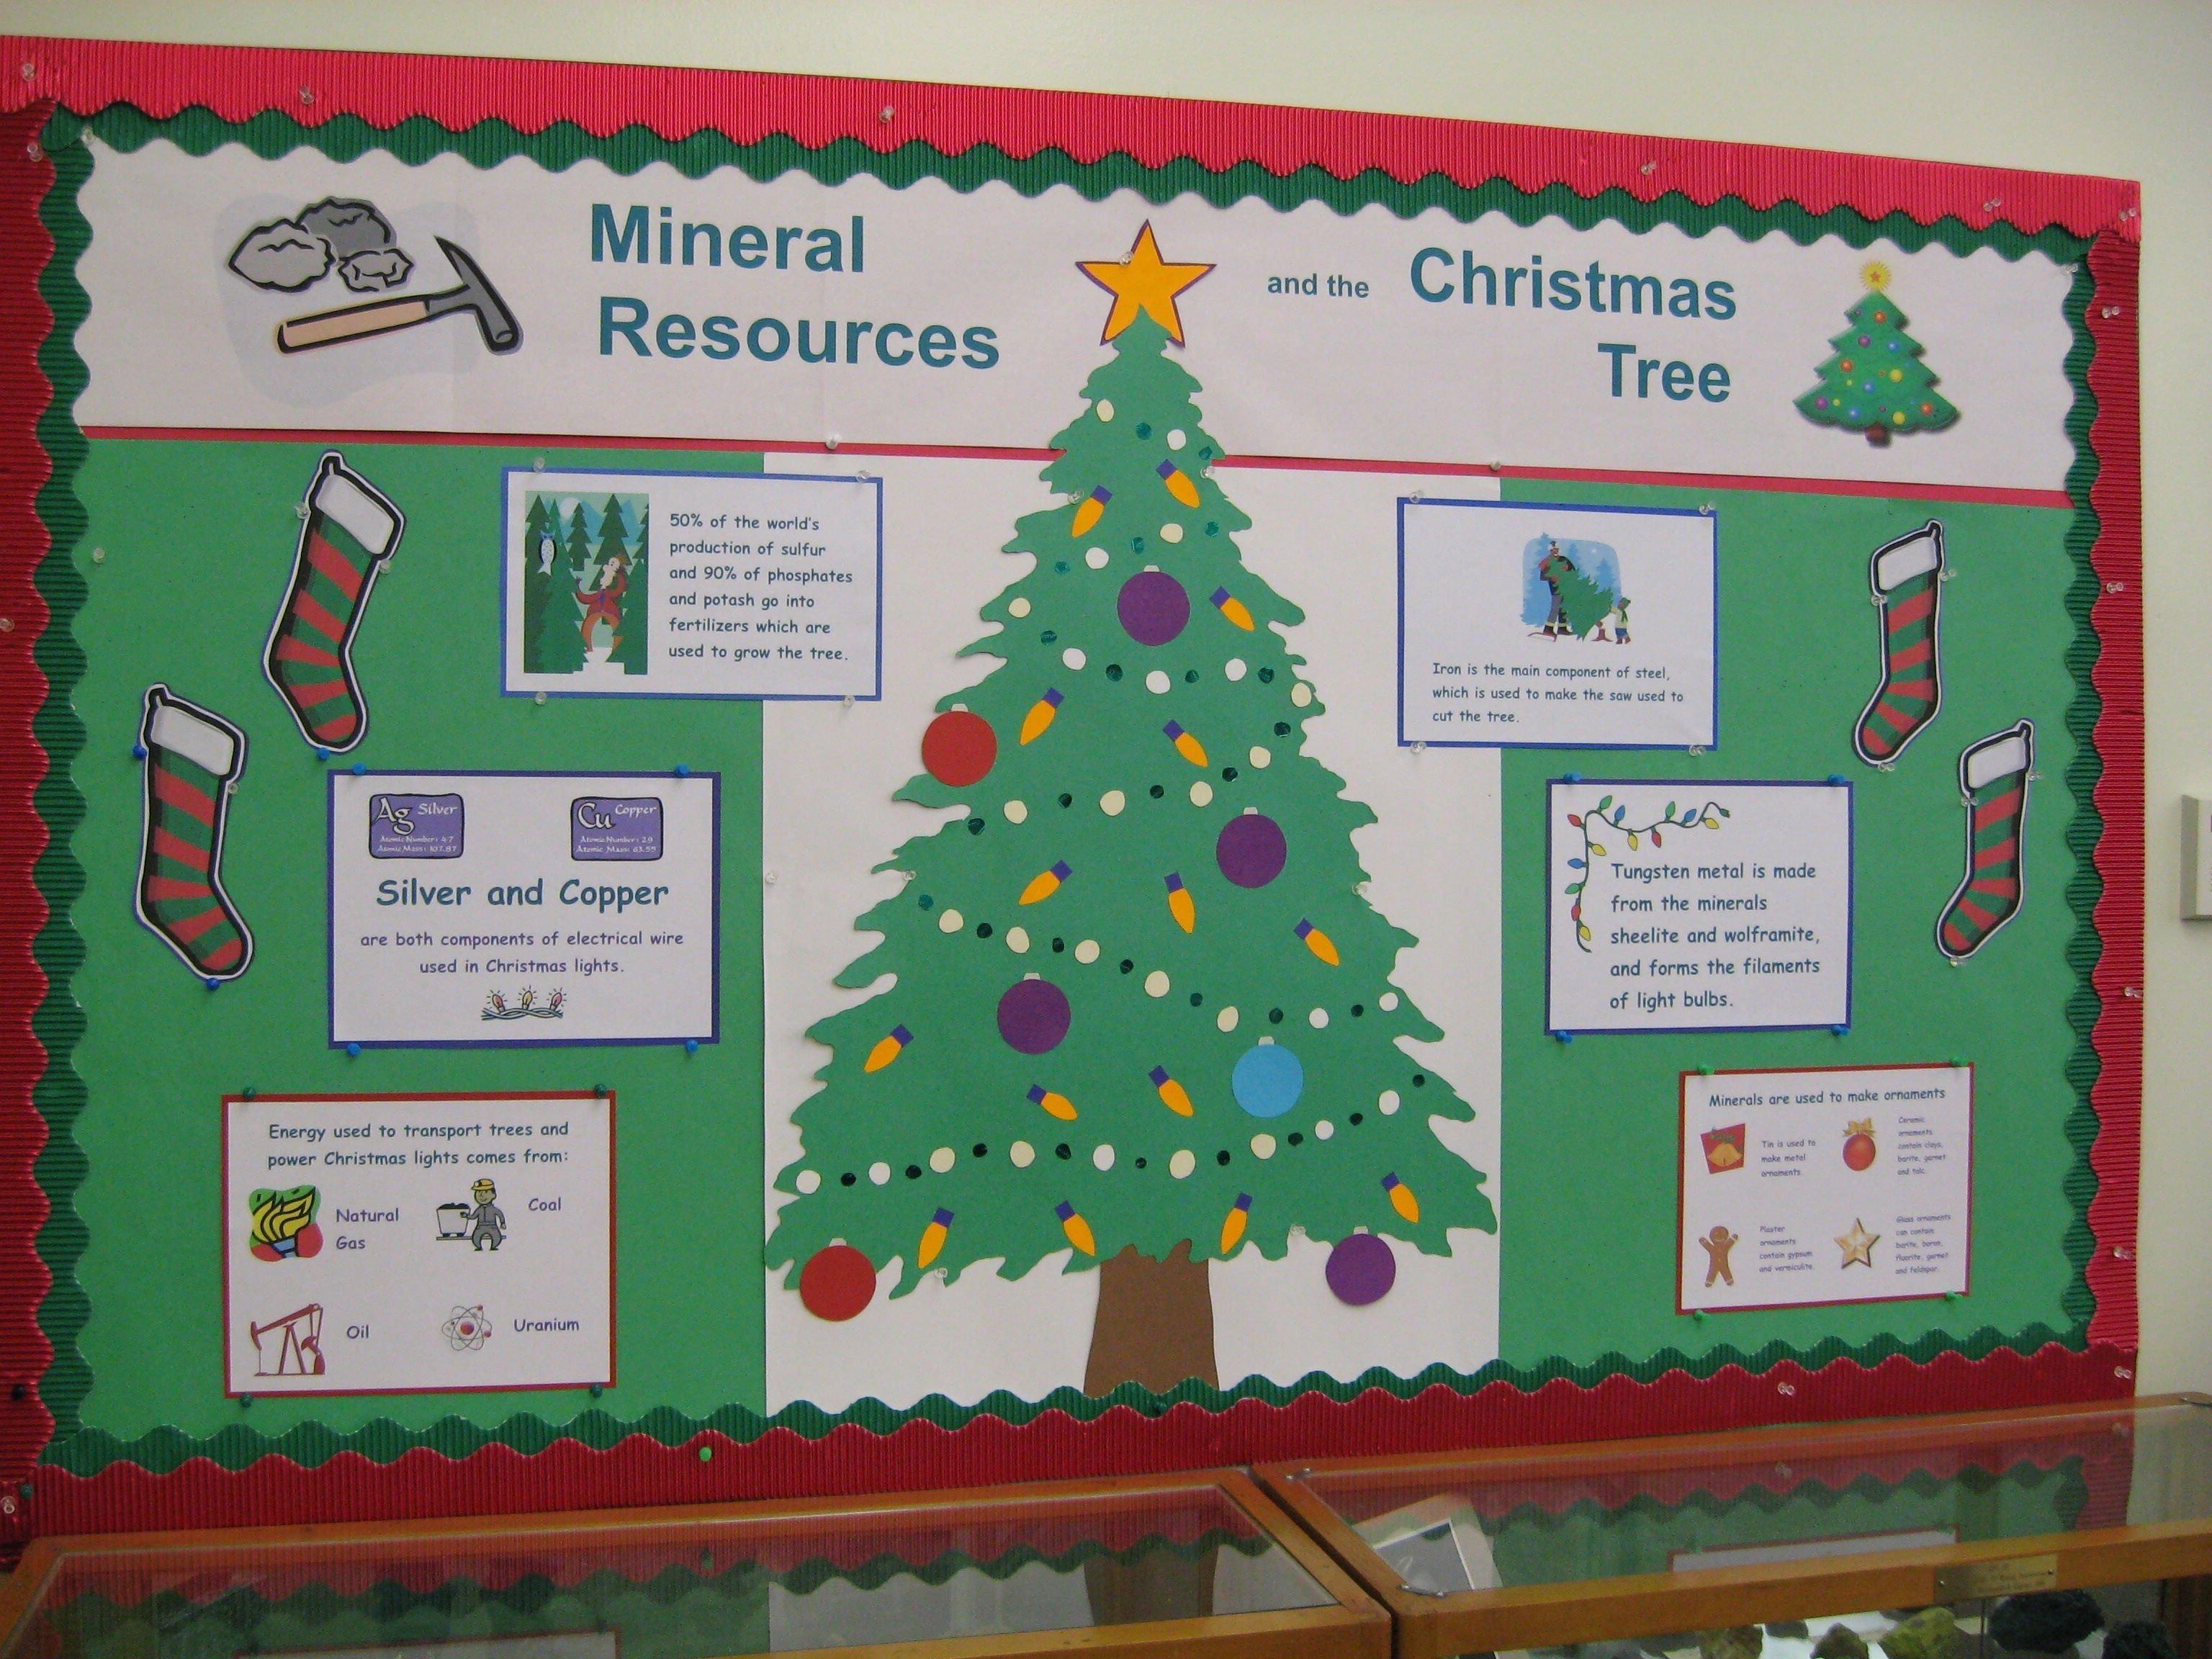 10 Attractive Christmas Tree Bulletin Board Ideas science bulletin board ideas mineral resources of christmas trees 2021